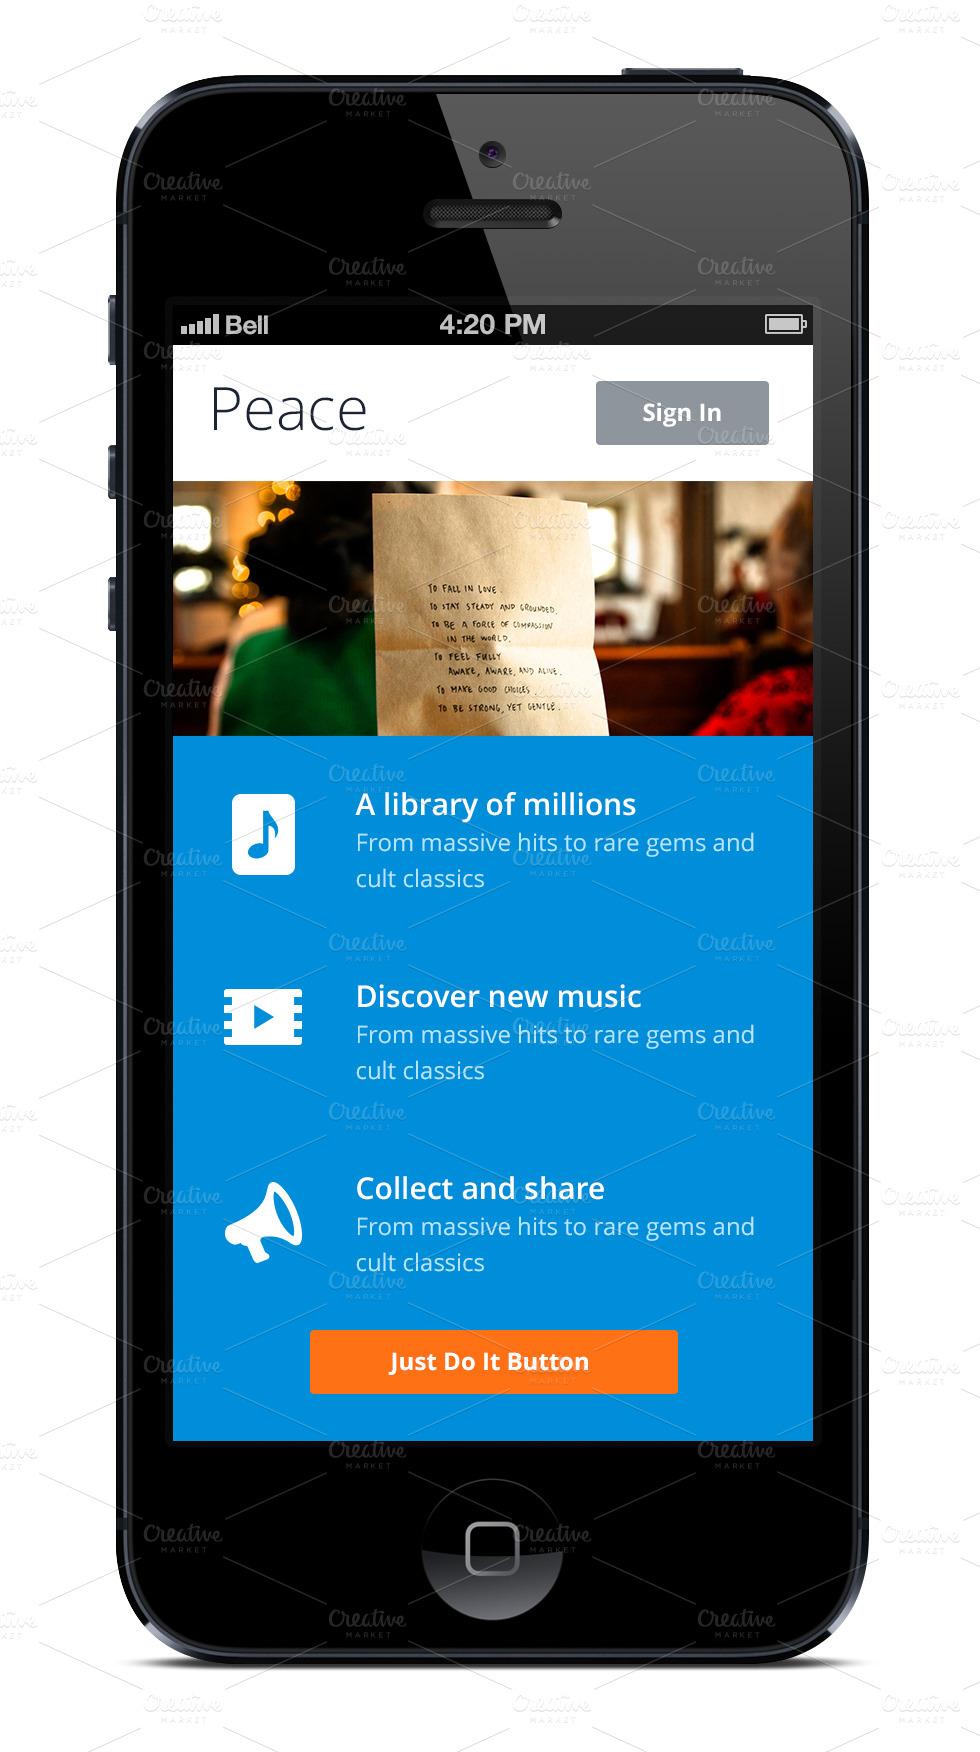 iphone app template blue website templates on creative market. Black Bedroom Furniture Sets. Home Design Ideas